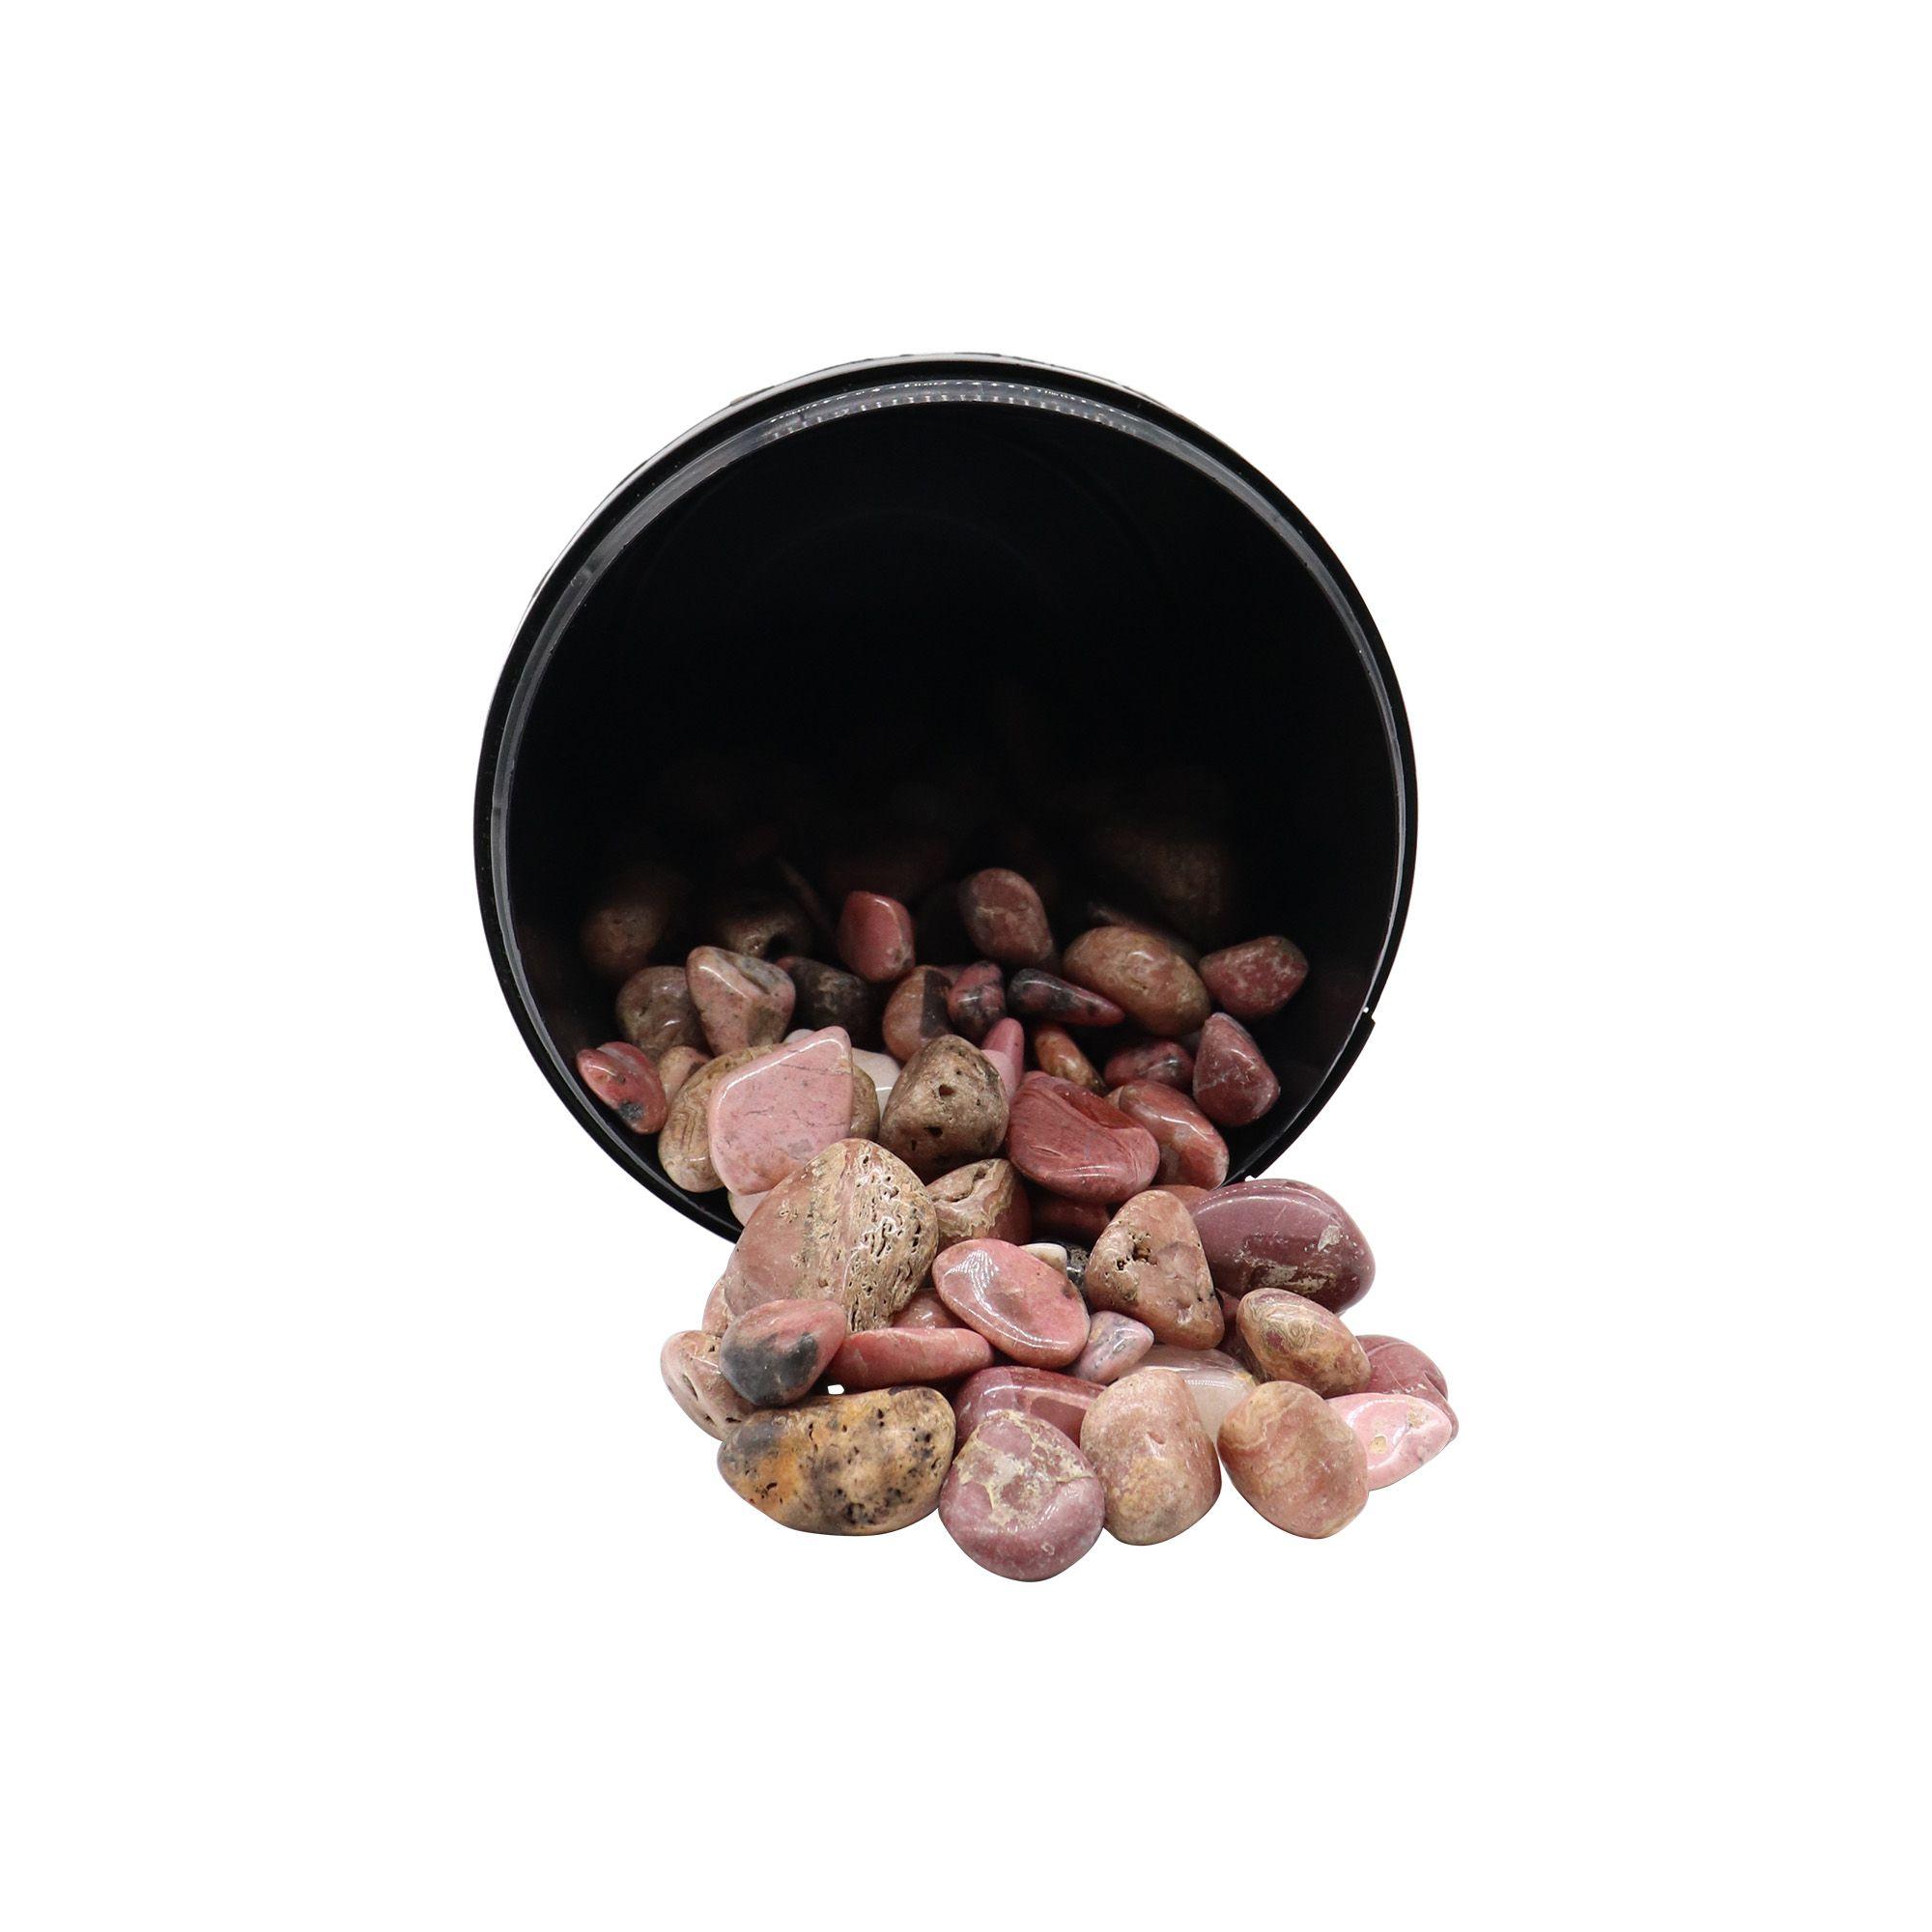 Kit com 5 pedras Rodocrosita ~ 7 à 25g